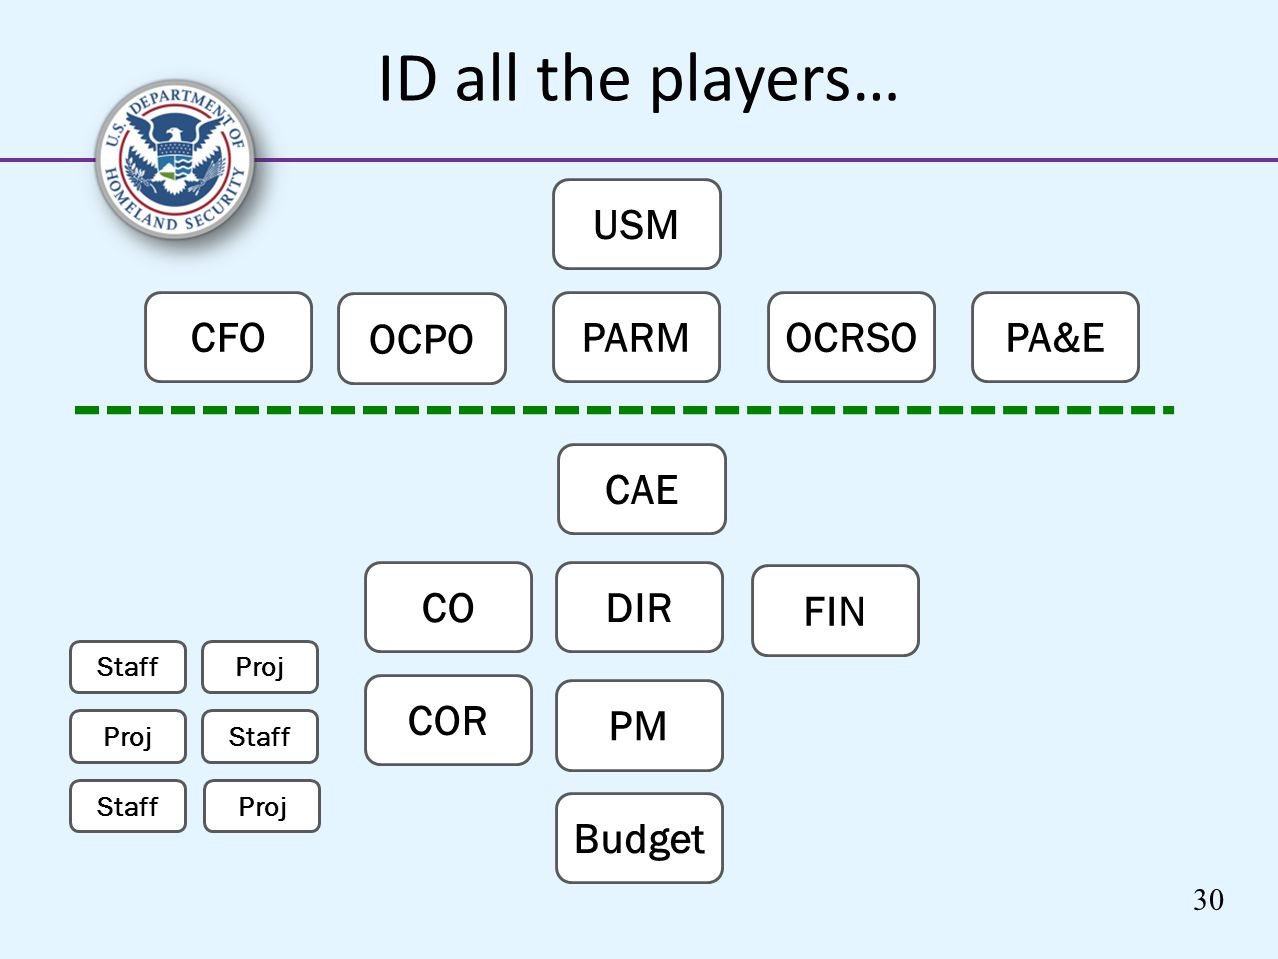 Fraud Busters Ppt Download 104086101 Fincor Circuit Board Repair Usm Cfo Ocpo Parm Ocrso Pae Cae Co Dir Fin Cor